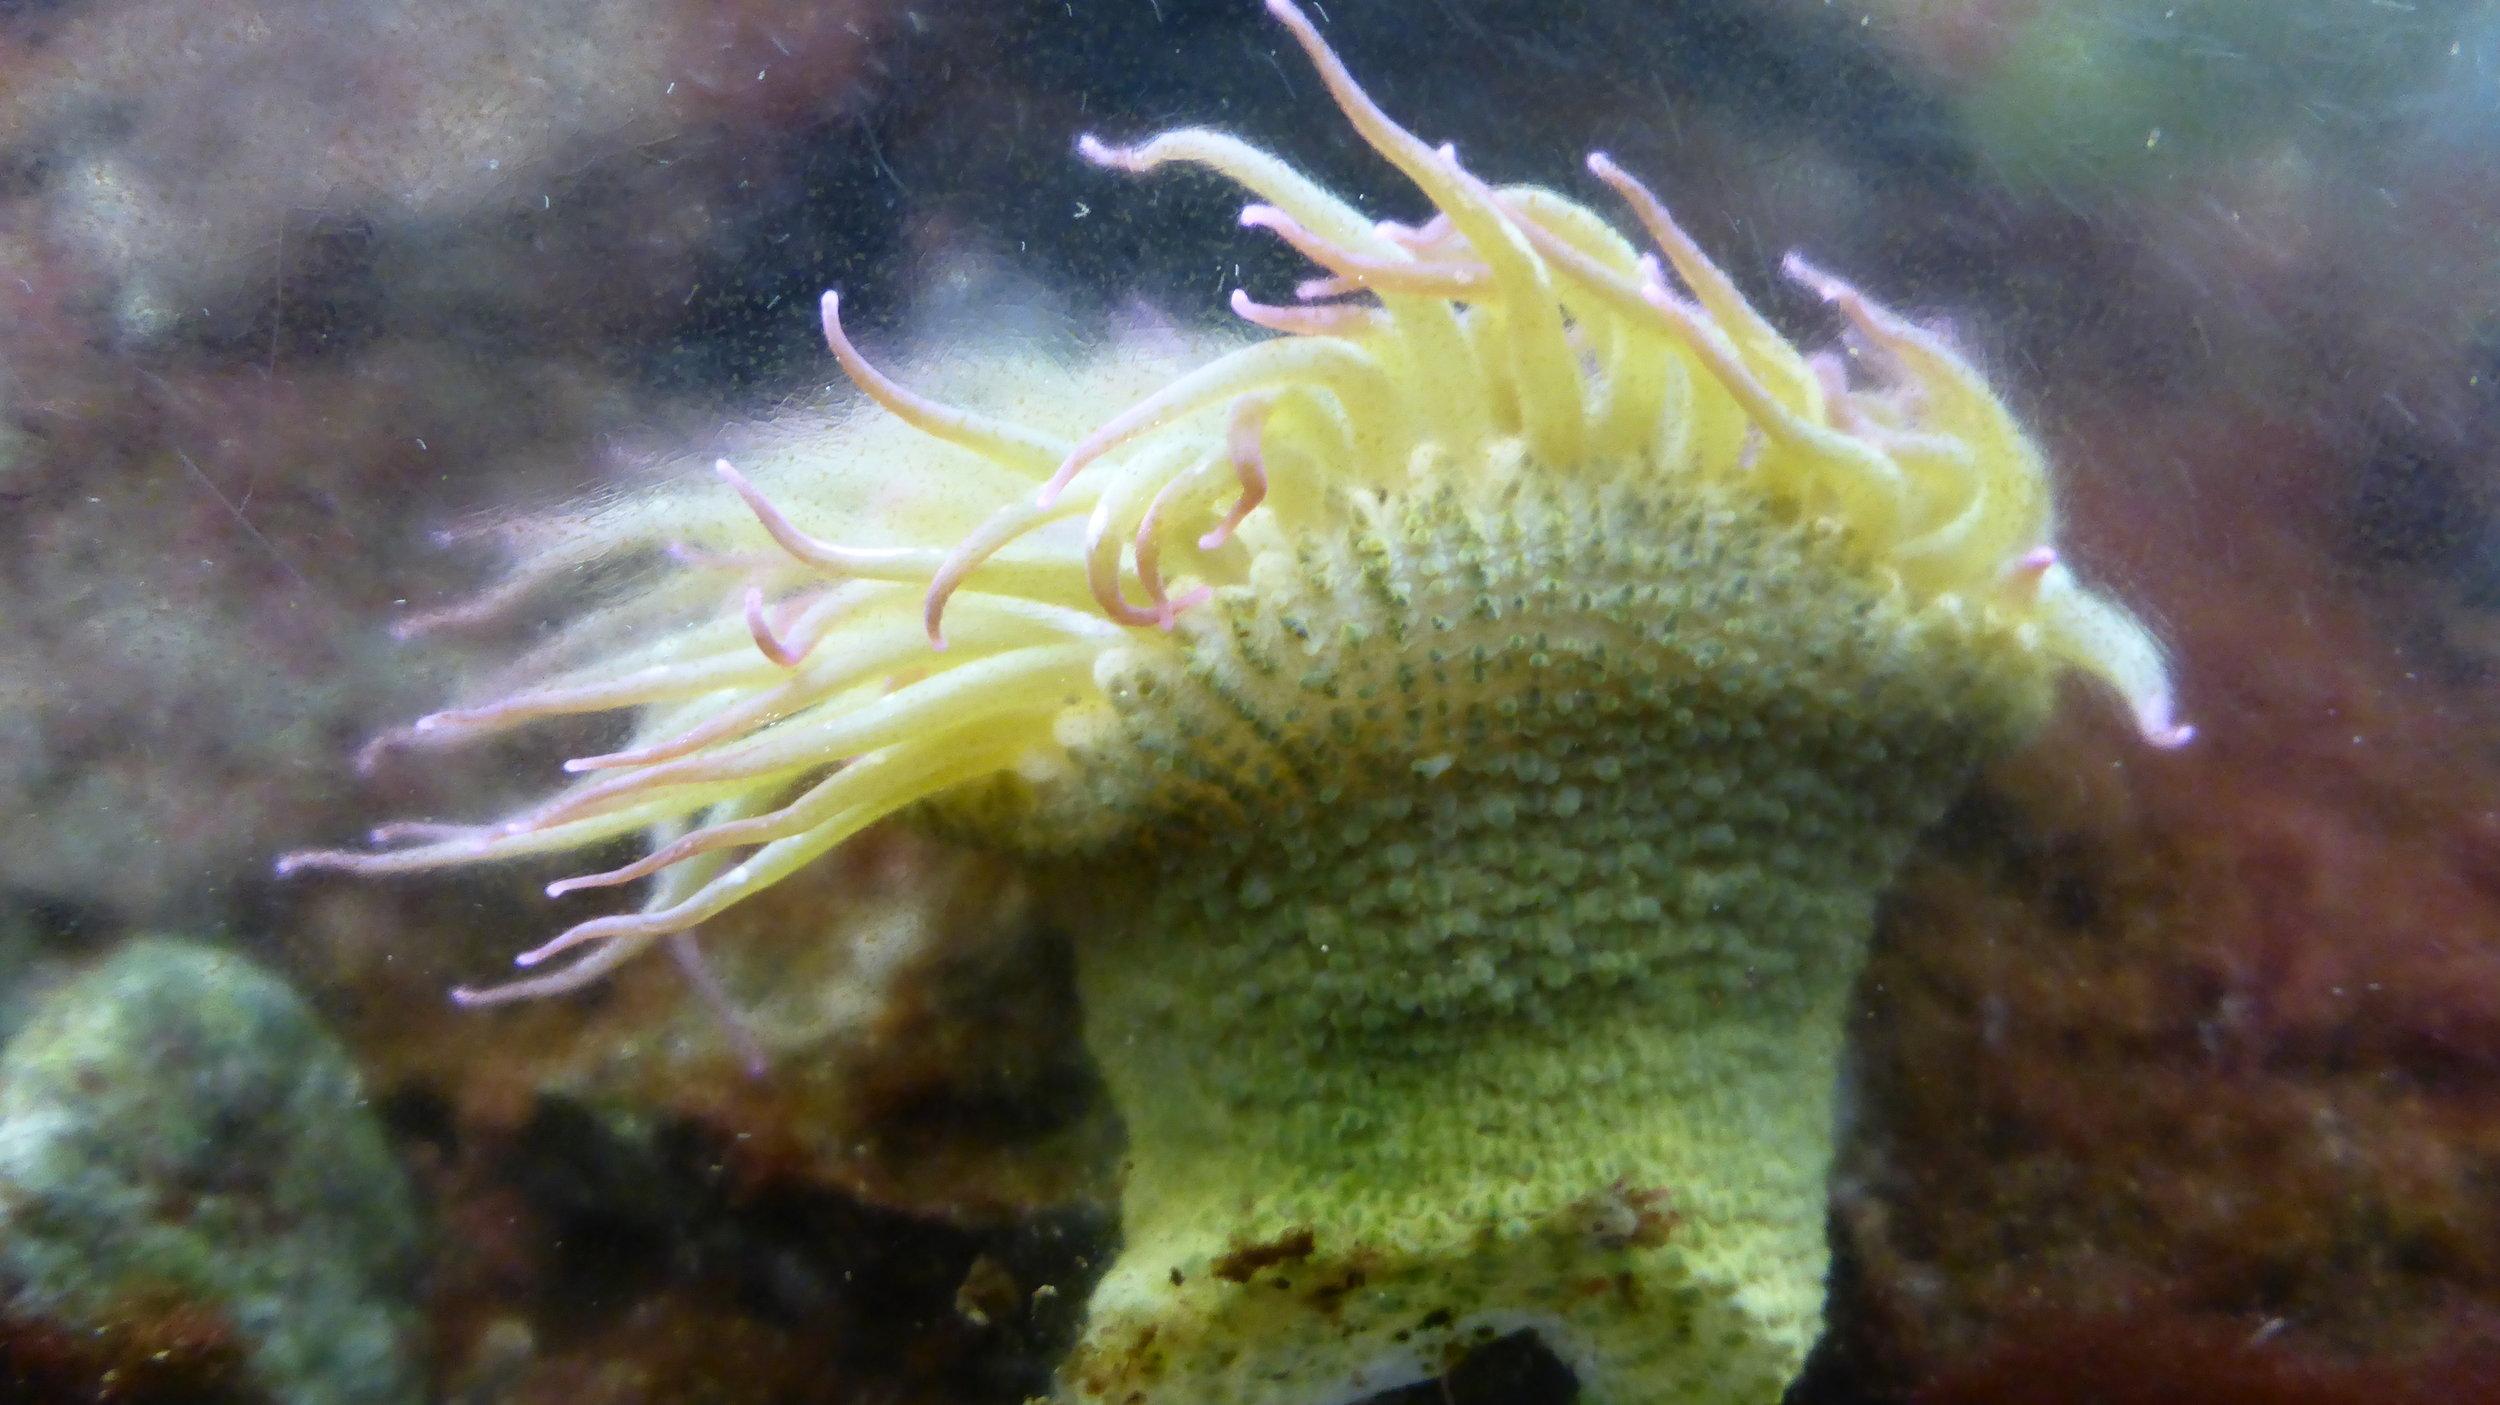 Sea anenome in the salt water aquarium at Point Cabrillo.